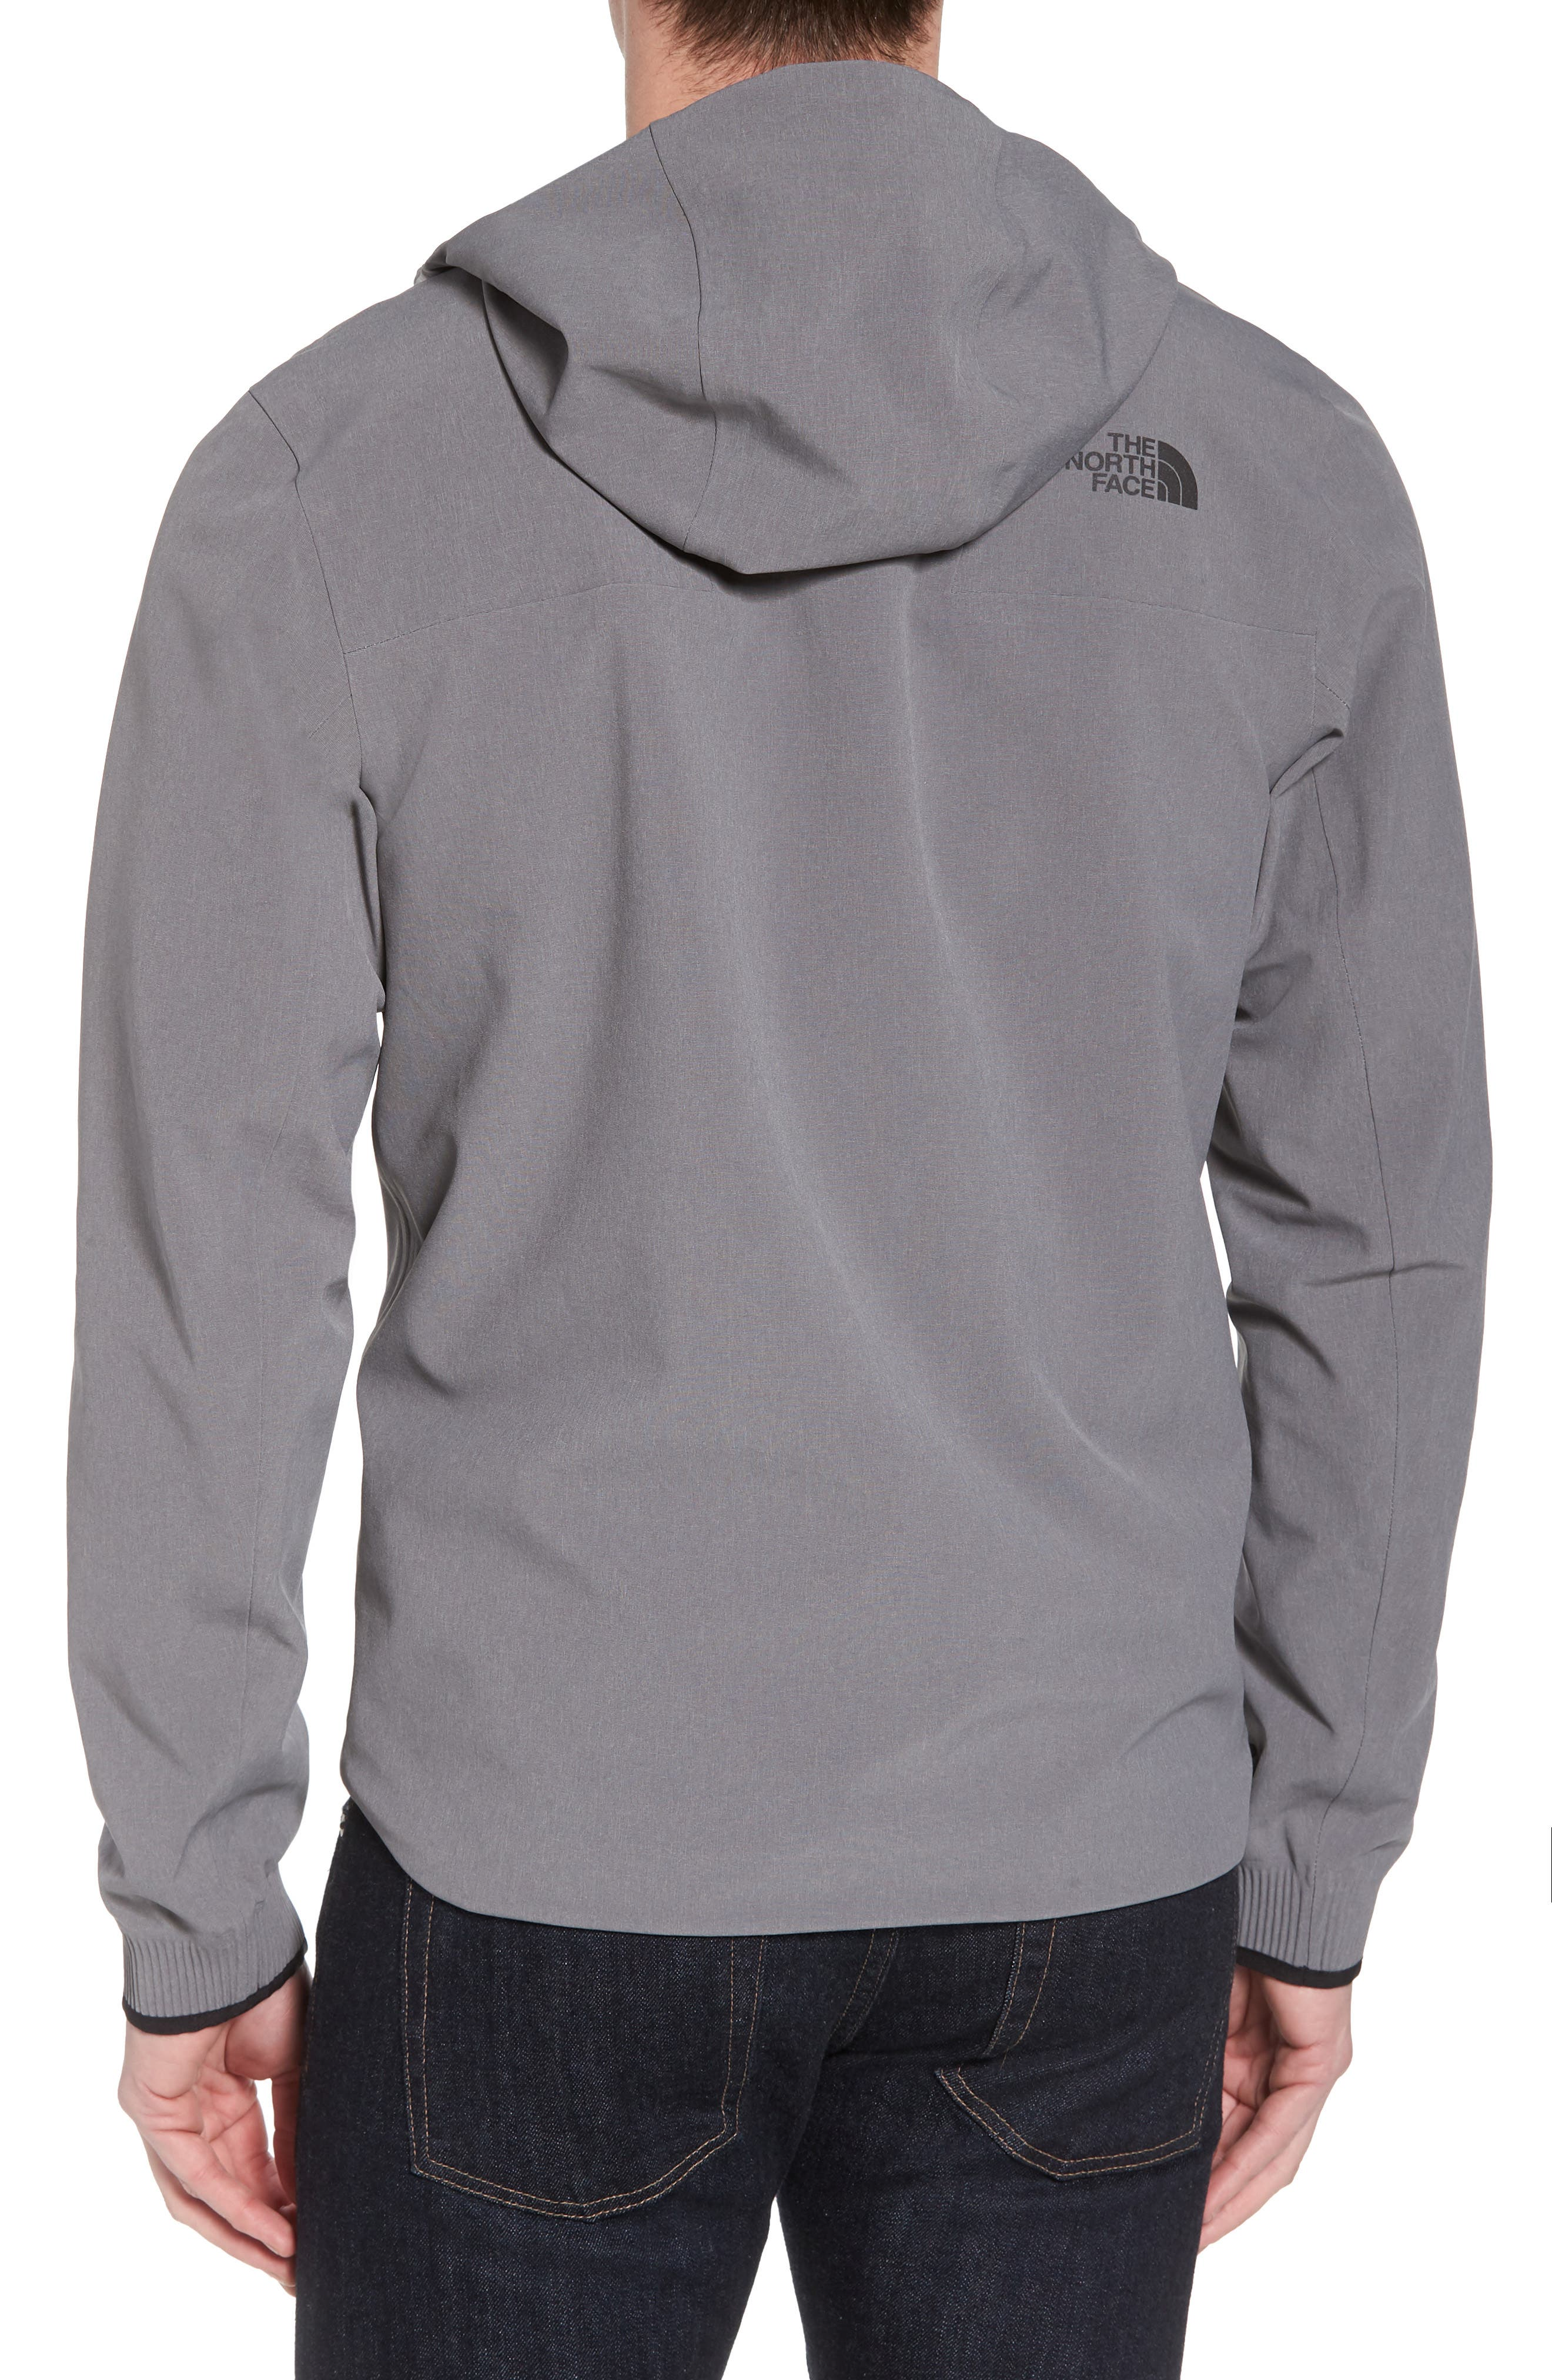 Apex Flex Gore-Tex<sup>®</sup> Waterproof Jacket,                             Alternate thumbnail 2, color,                             Medium Grey Heather